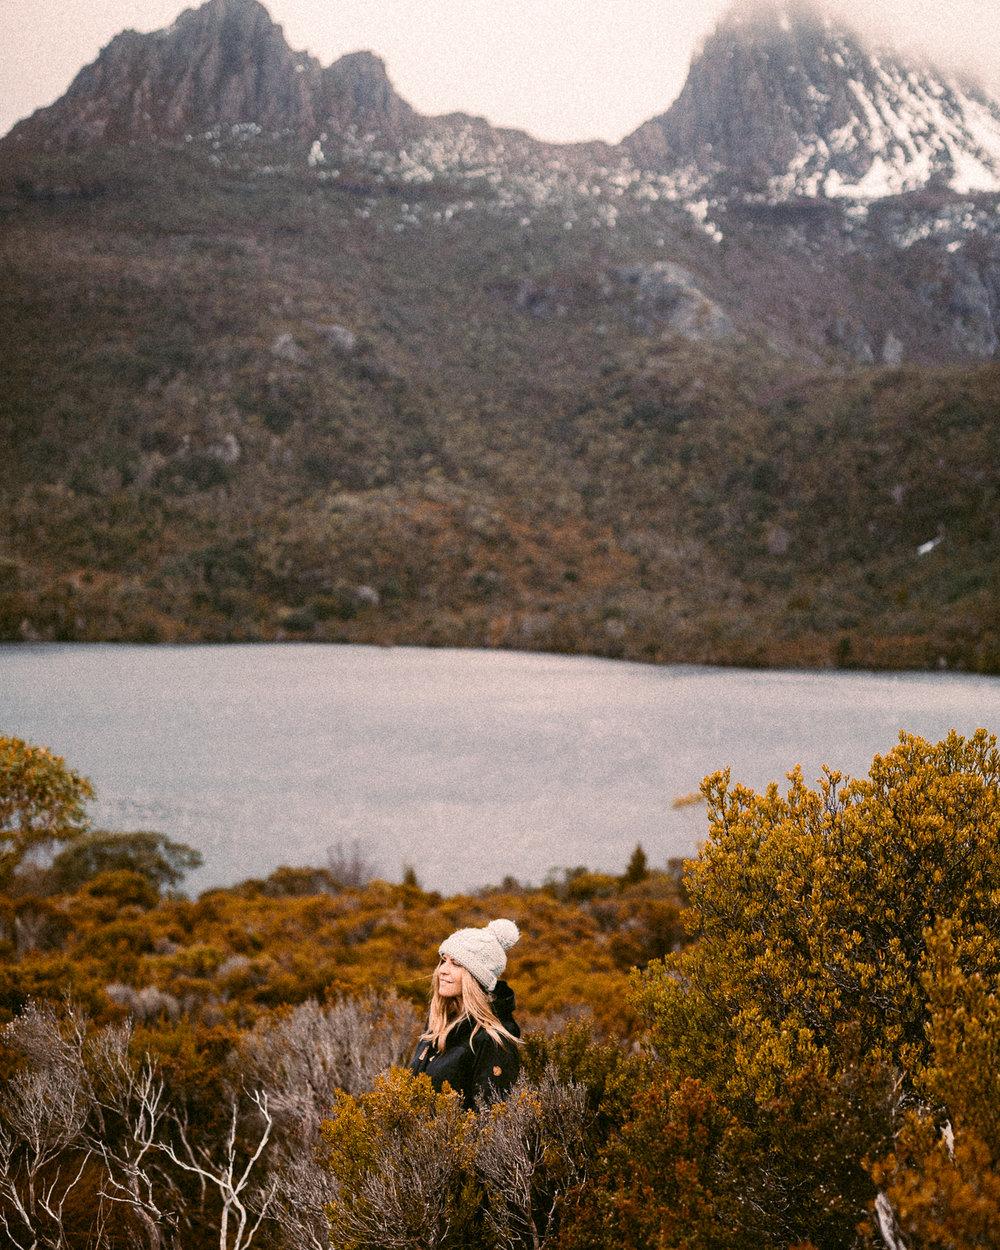 Melissa-Findley-Cradle-Mountain-Lodge-MFBLOG-15.jpg